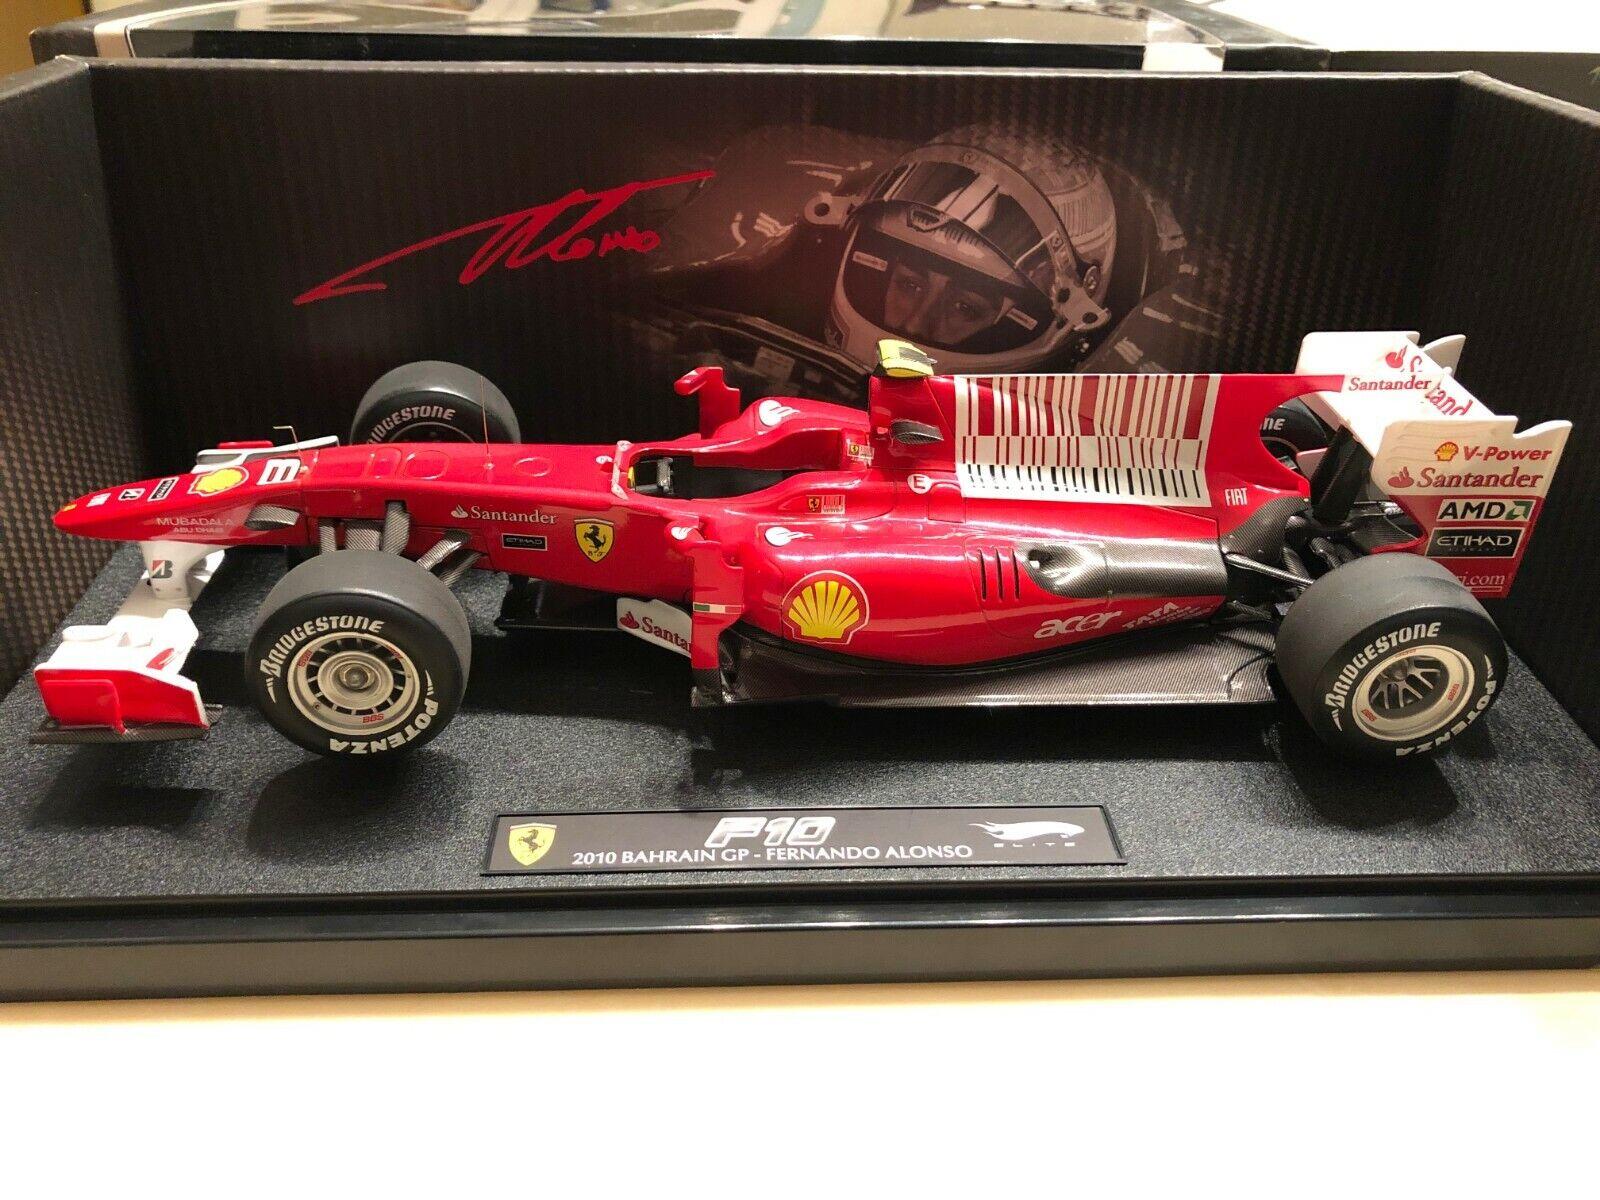 venta directa de fábrica Ferrari F10 Fernando Fernando Fernando Alonso 2010 Bahrein GP ganador 1 18 escala por Hotwheels Elite  precio al por mayor